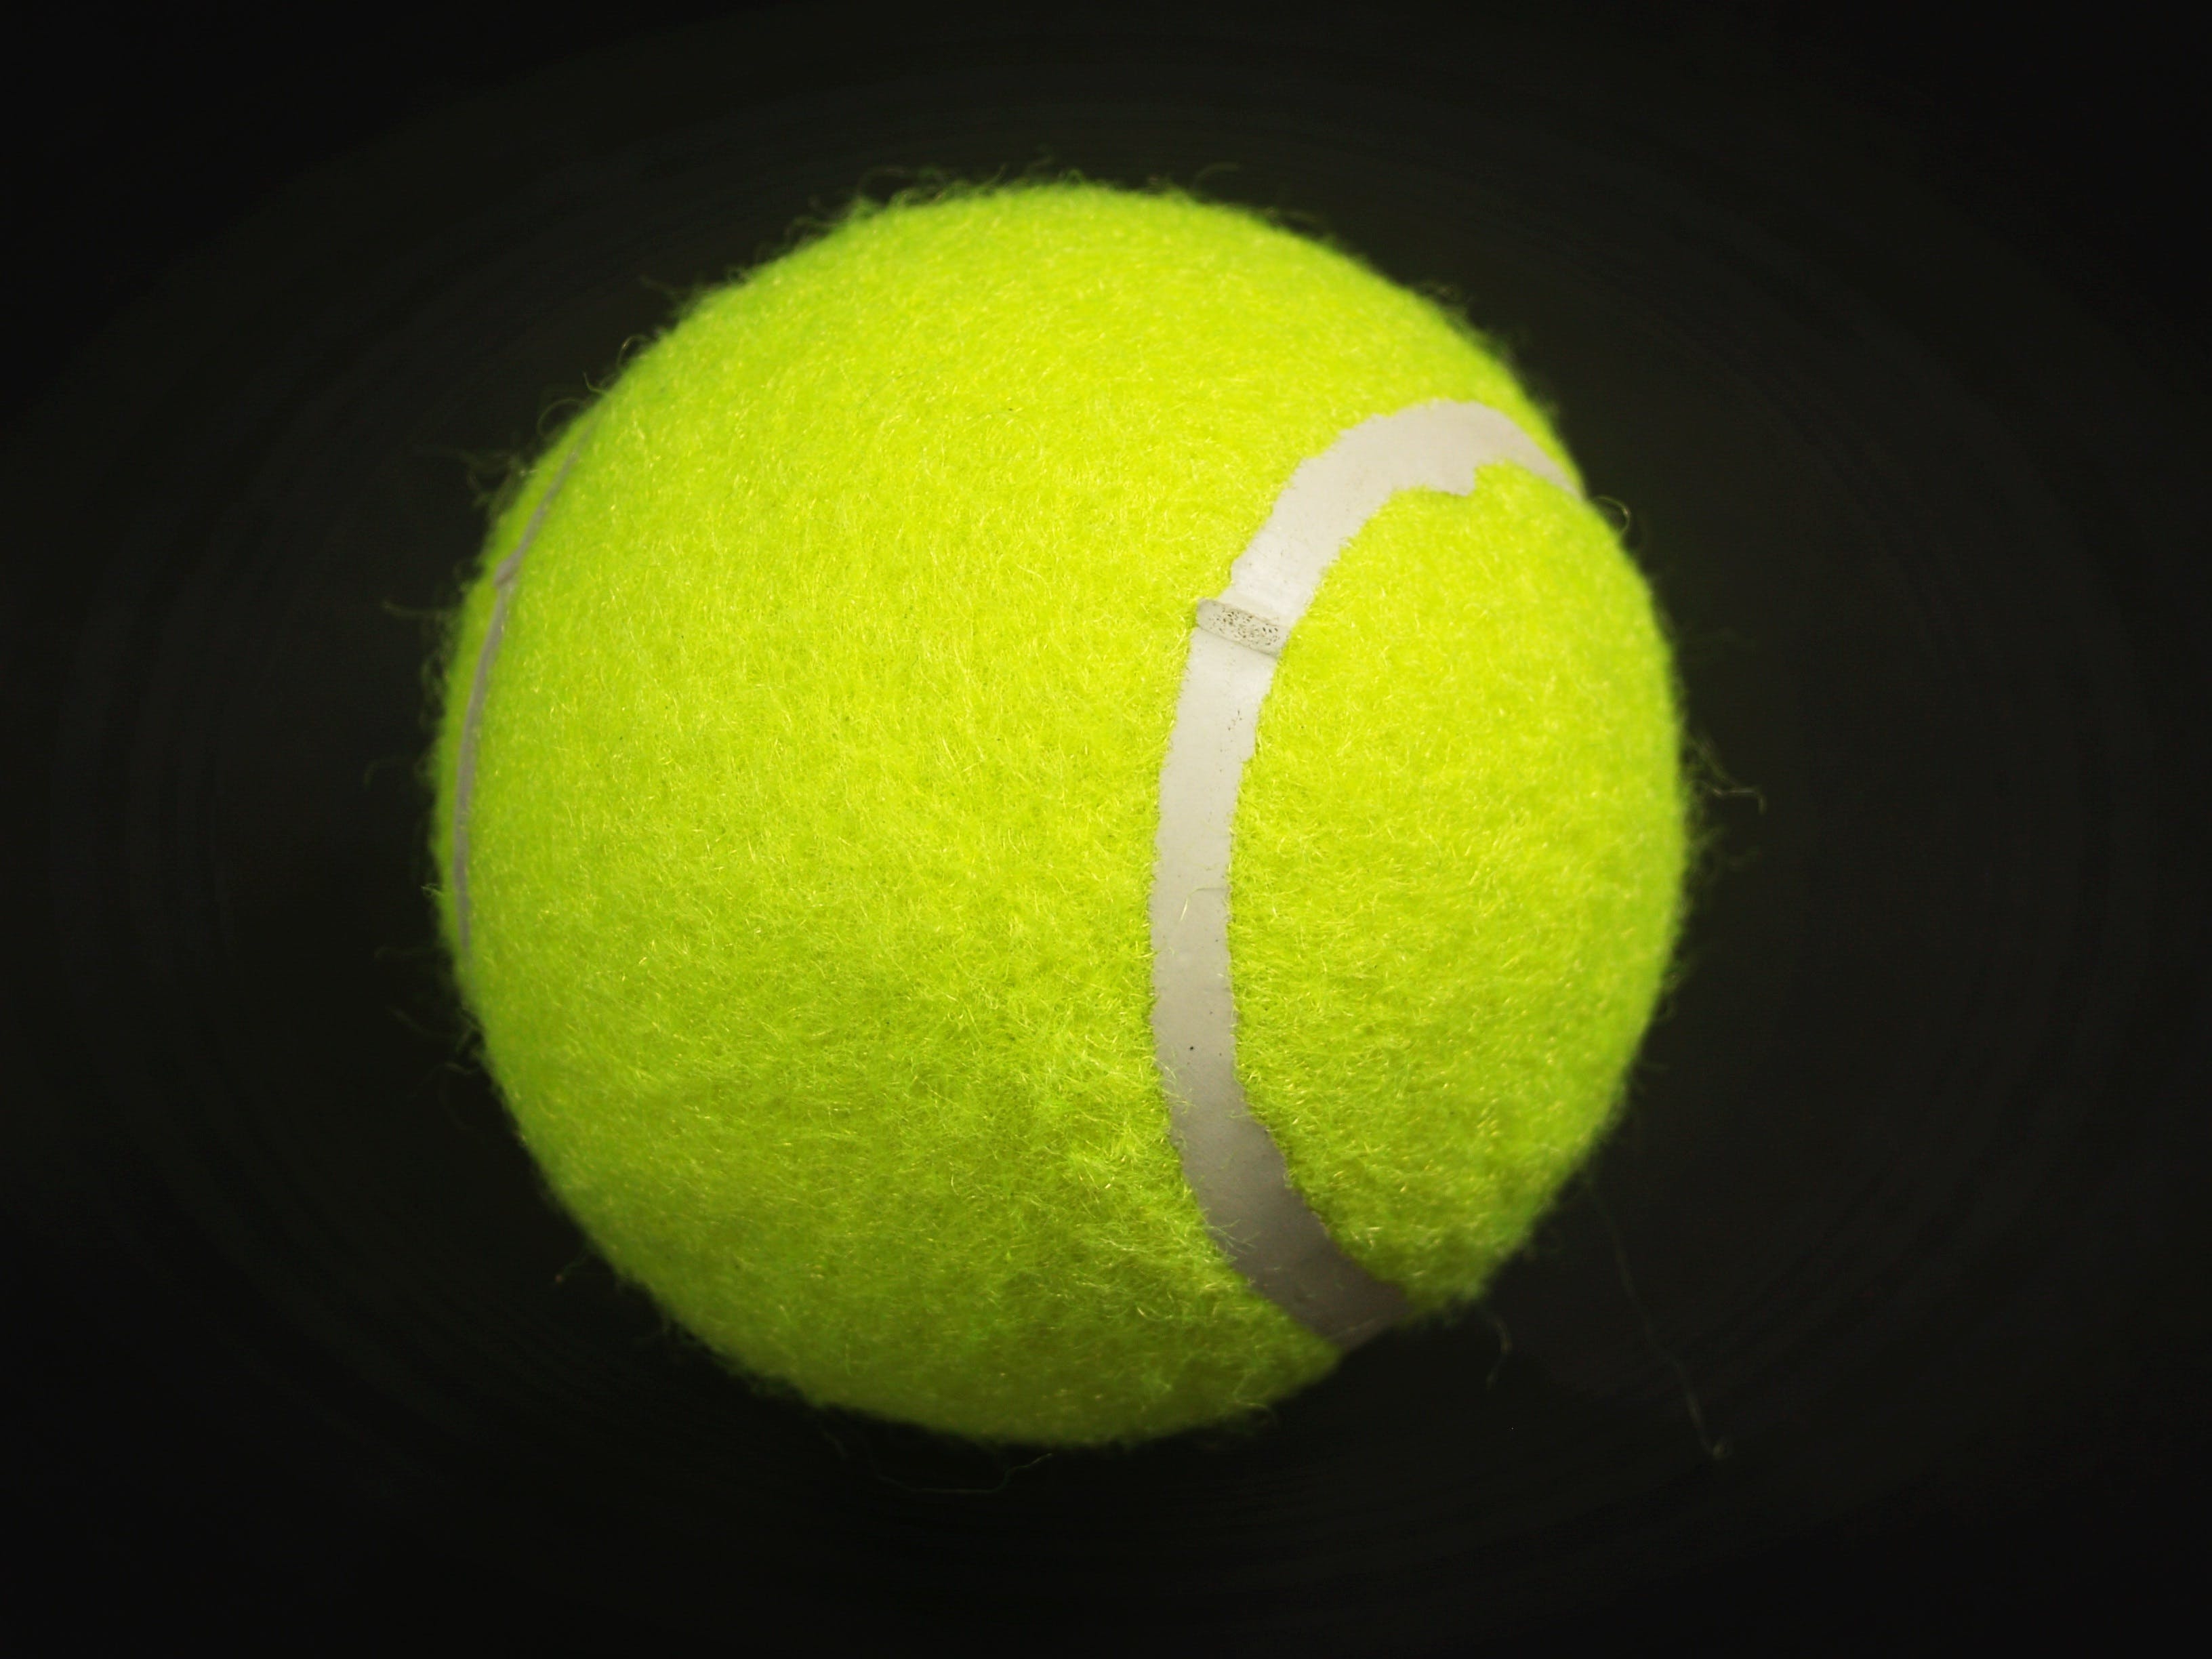 action, athlete, ball